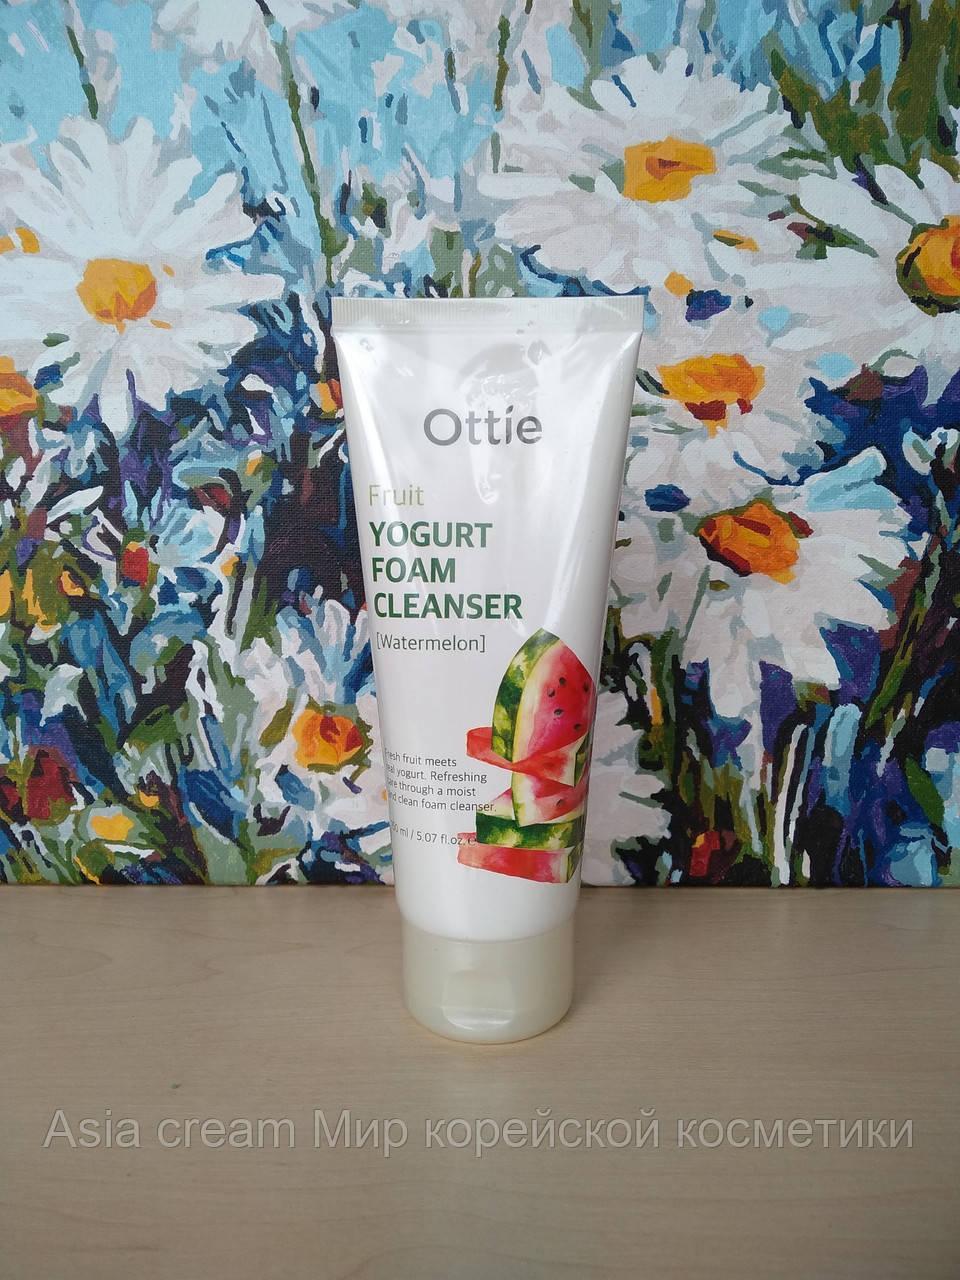 Йогуртовая пенка для умывания с экстрактом арбуза Ottie Fruits Yogurt Foam Cleanser Watermelon